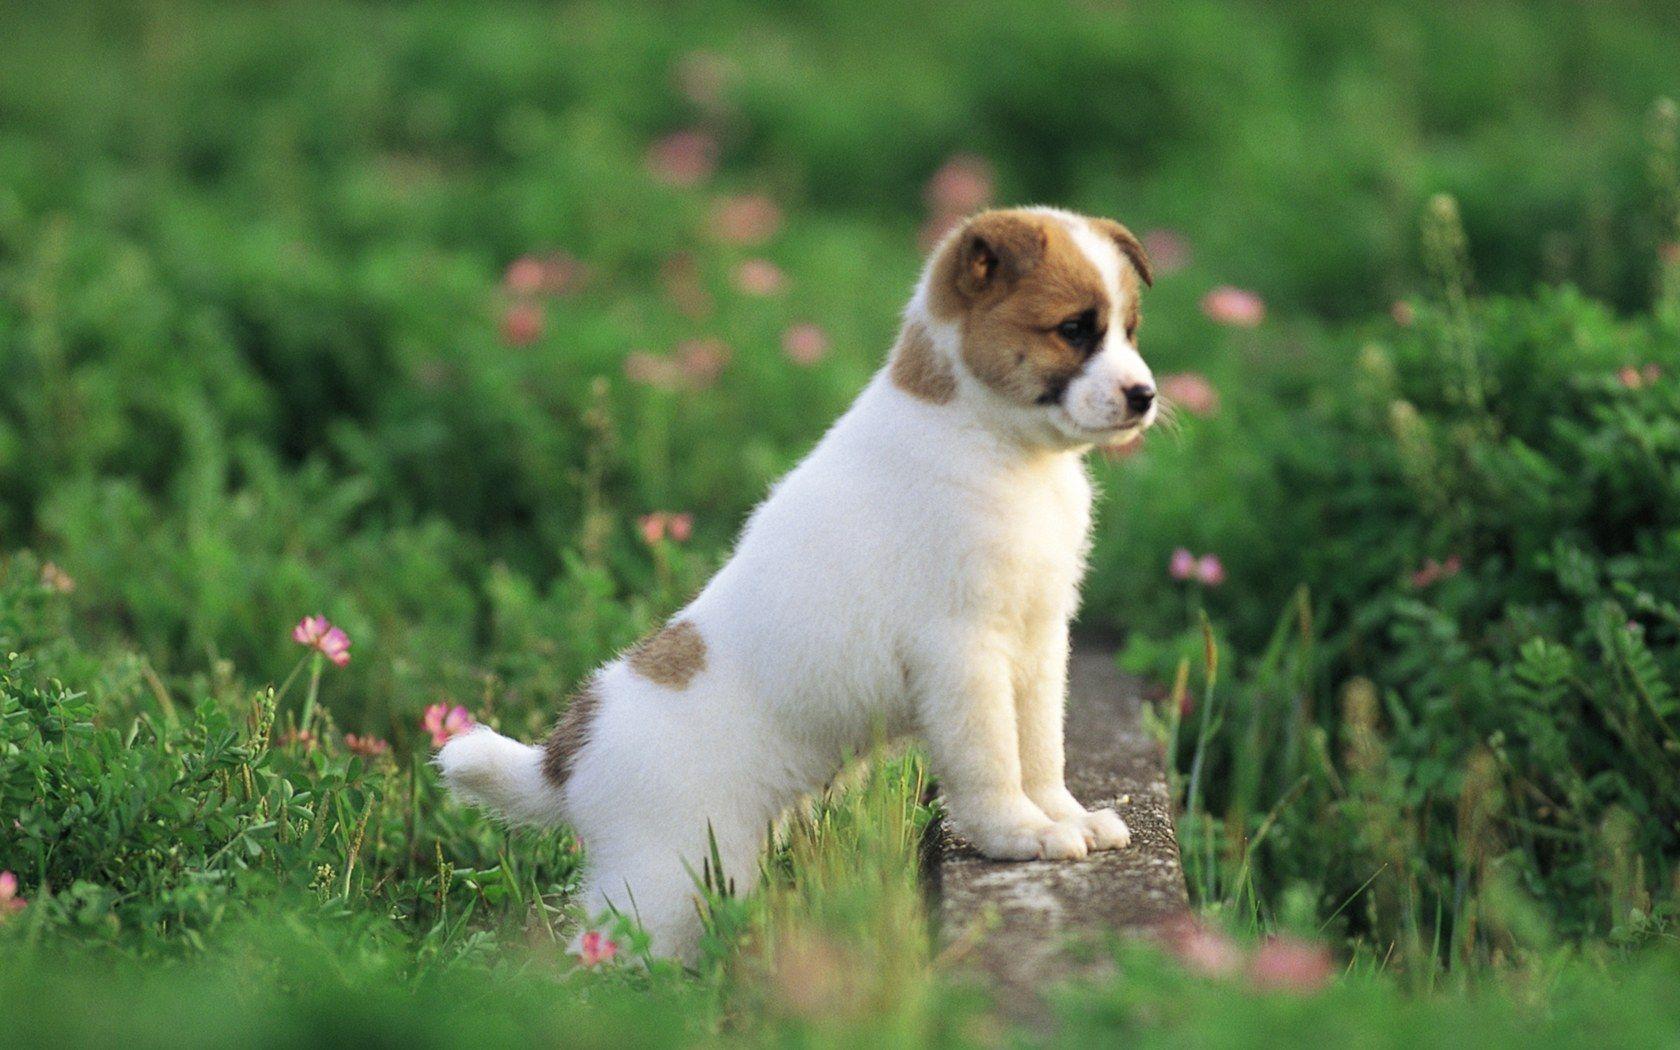 Pitbull Dog Puppy Hd Wallpapers Beautiful Desktop Widescreen